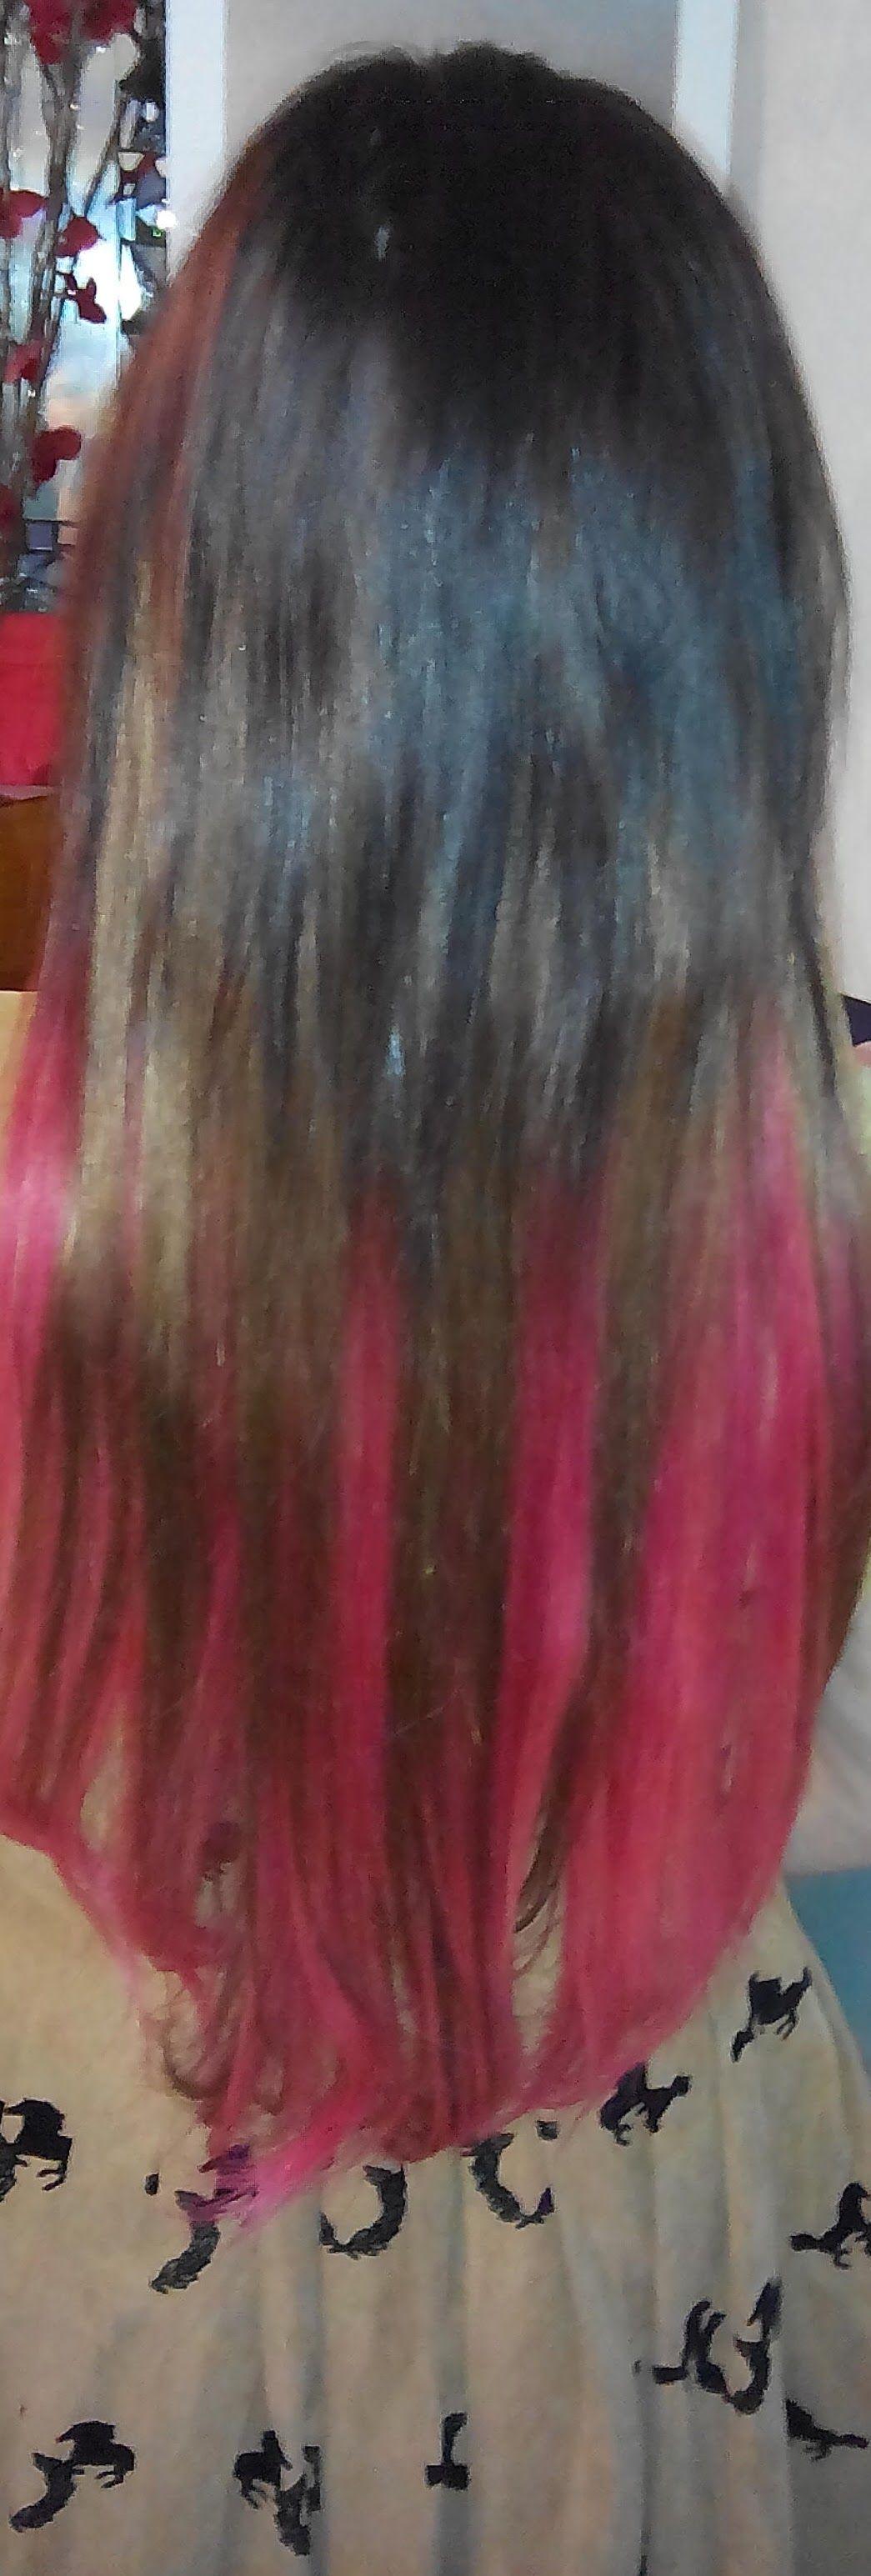 Tape Inn Hair Custom Made Color Sprattz Hair Extensions Sprattz